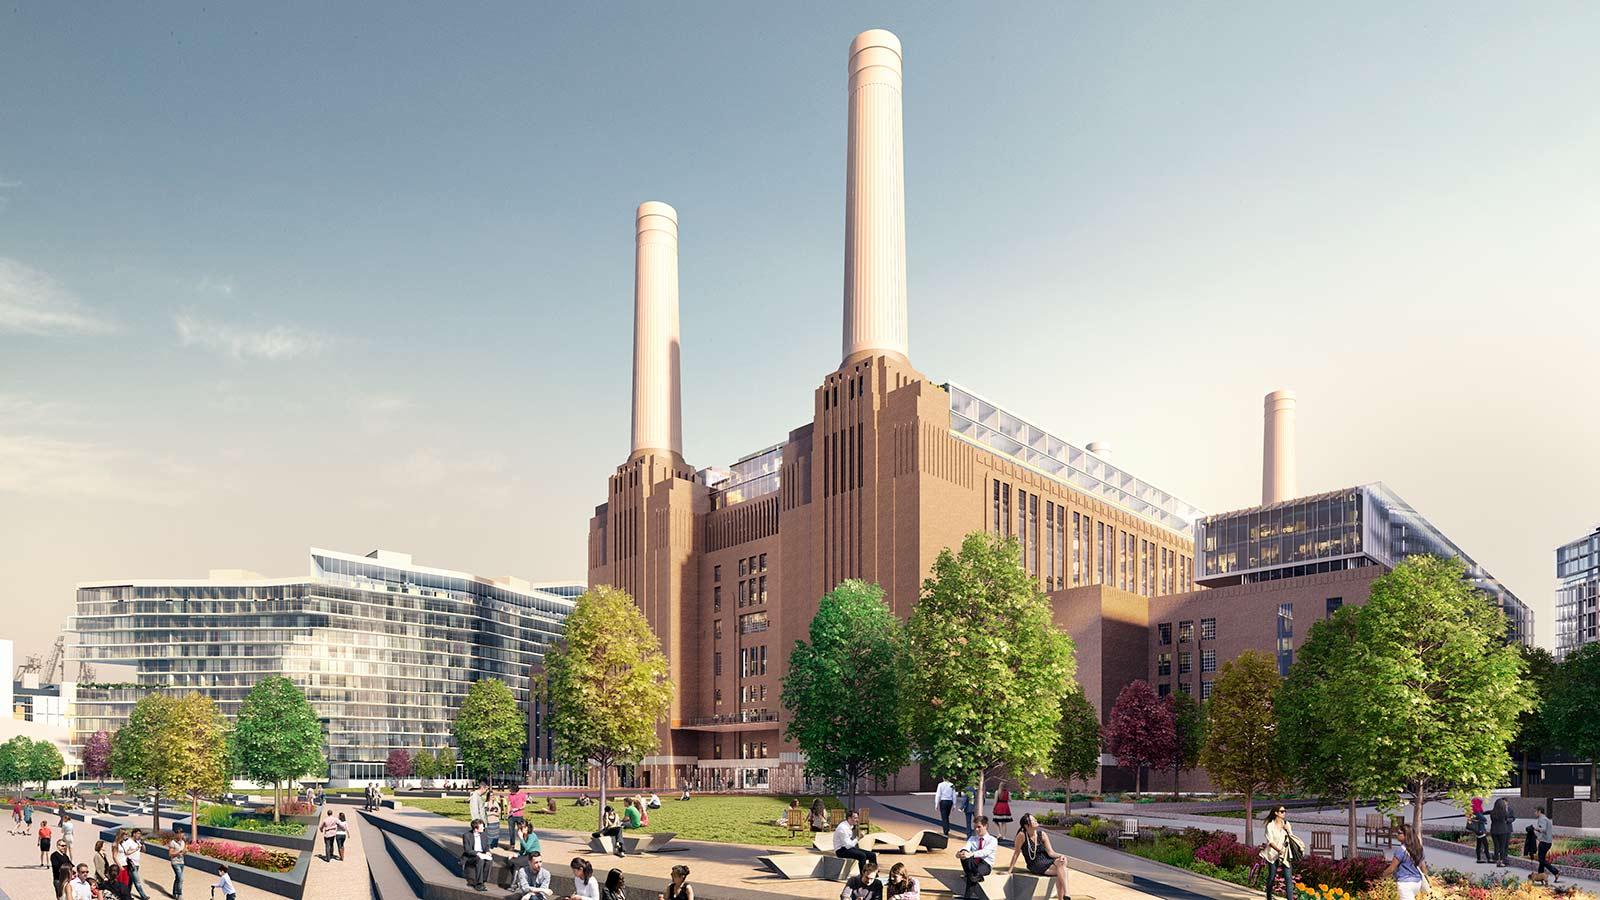 Battersea Power Station - Phase 2: Powering on in Battersea | Mace